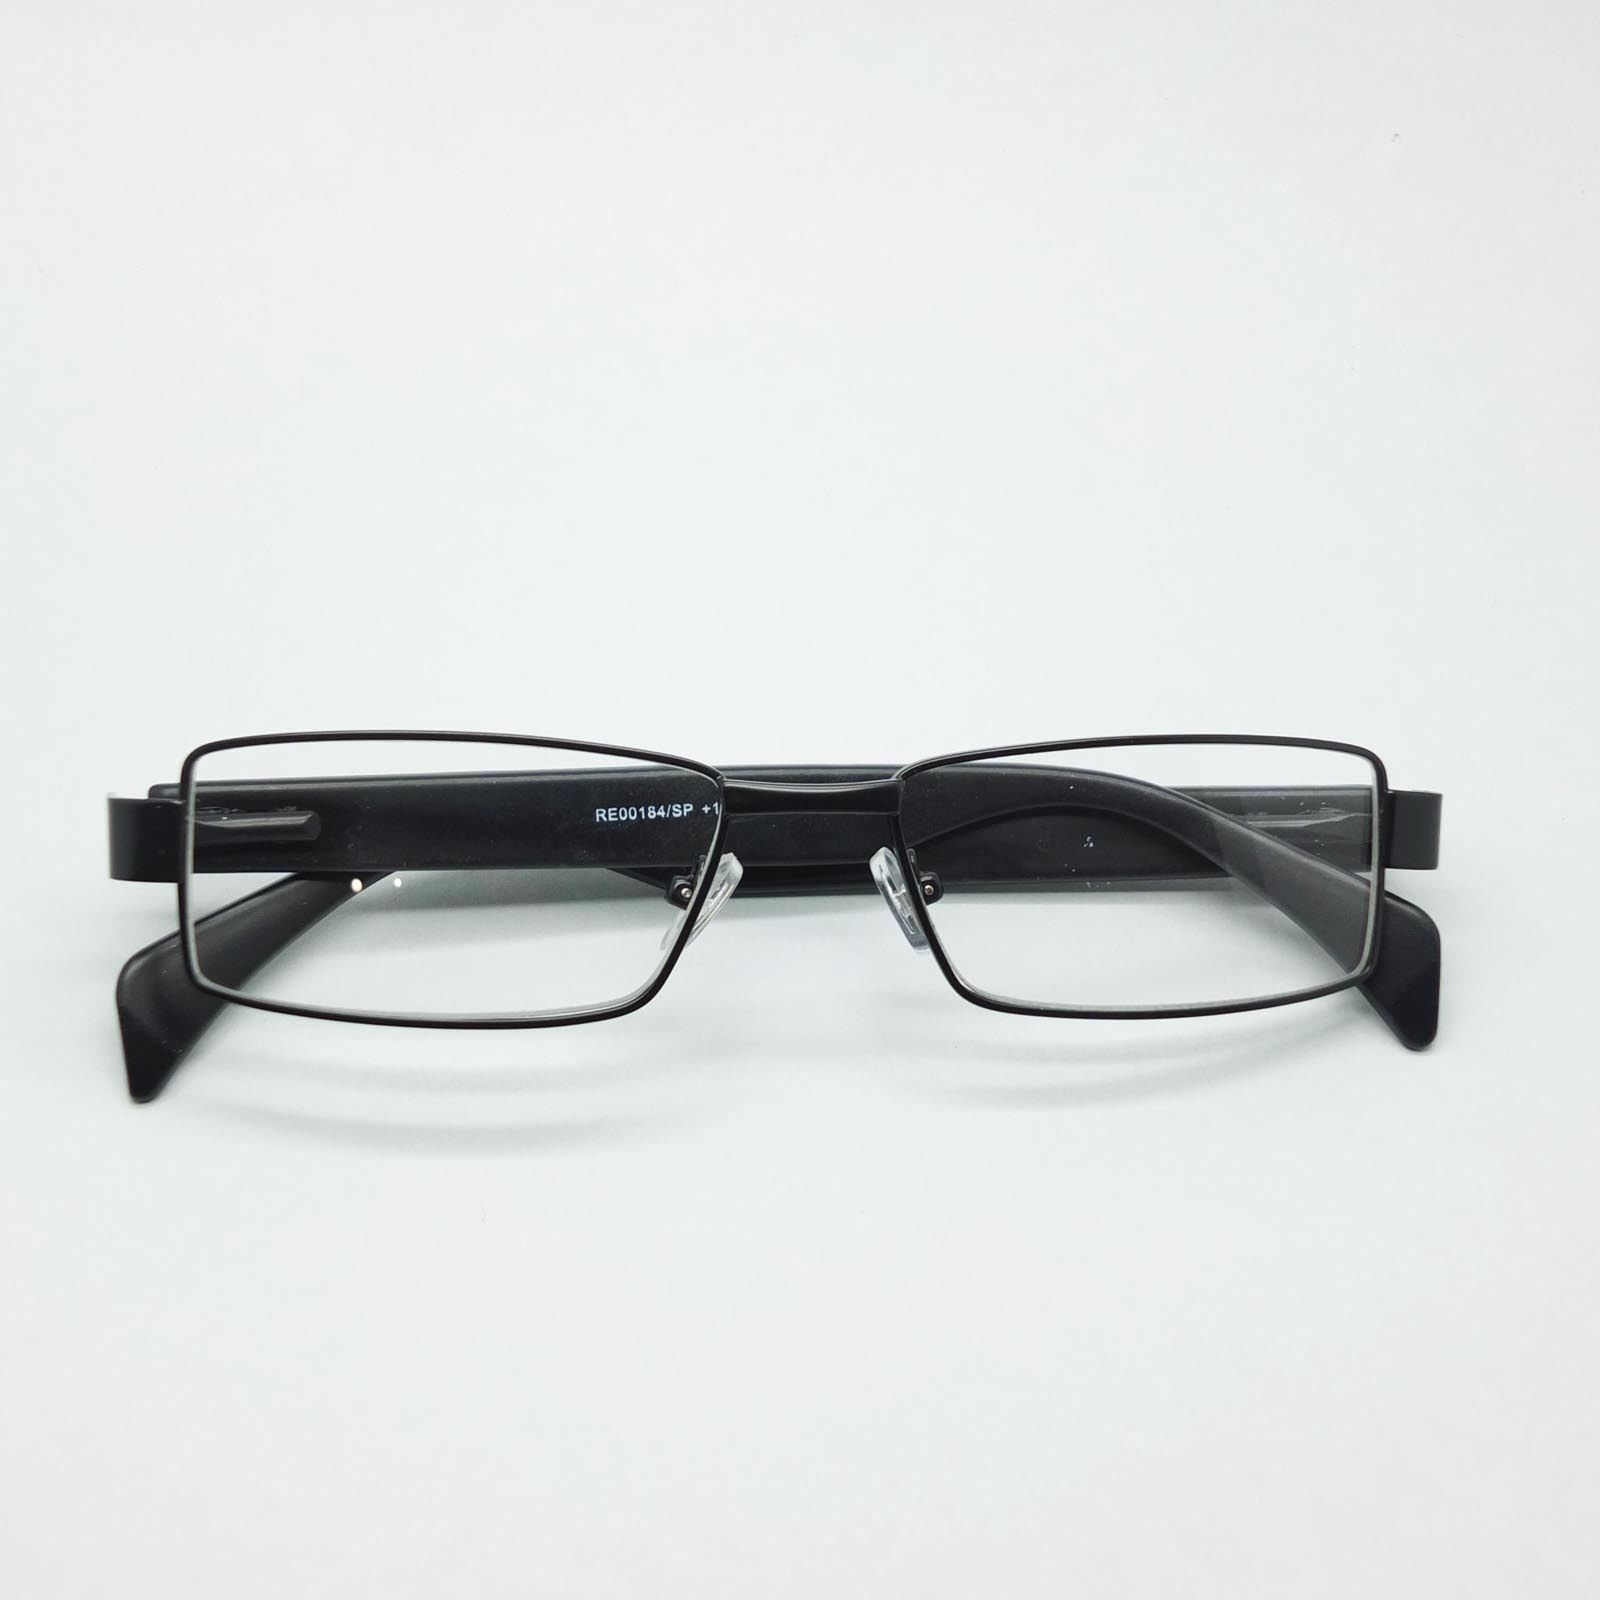 Reading Glasses Super Hi Tech Metro Metal Frame Jazz Black White Detail +4.00 image 4